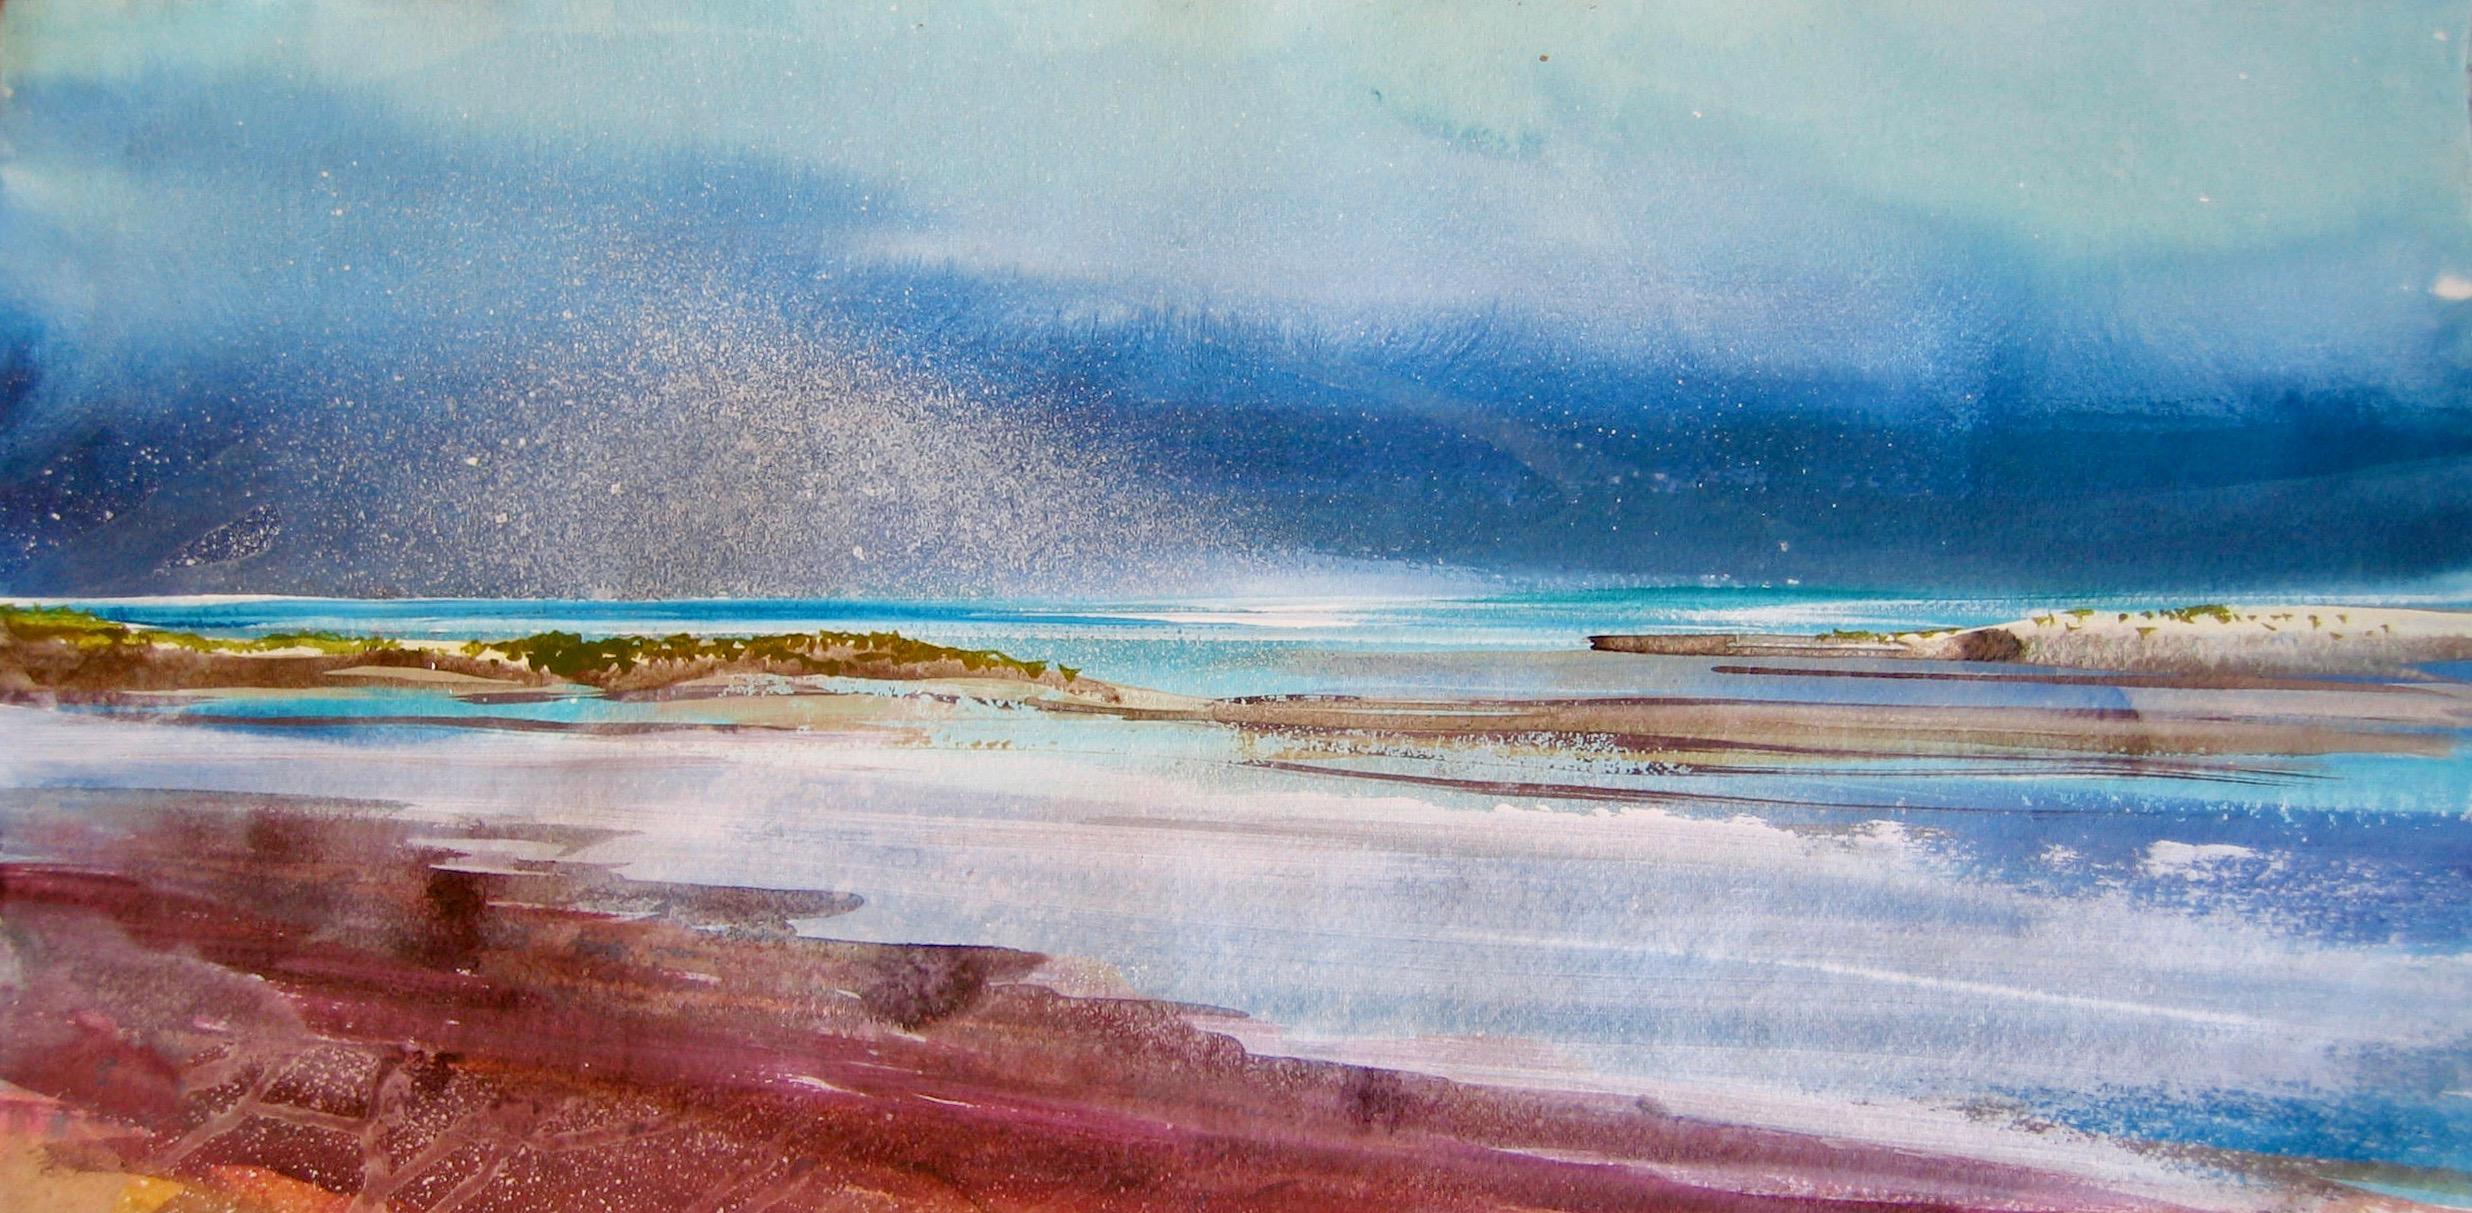 Turquiose seas Holkham 34x68cm acrylic on paper.jpg